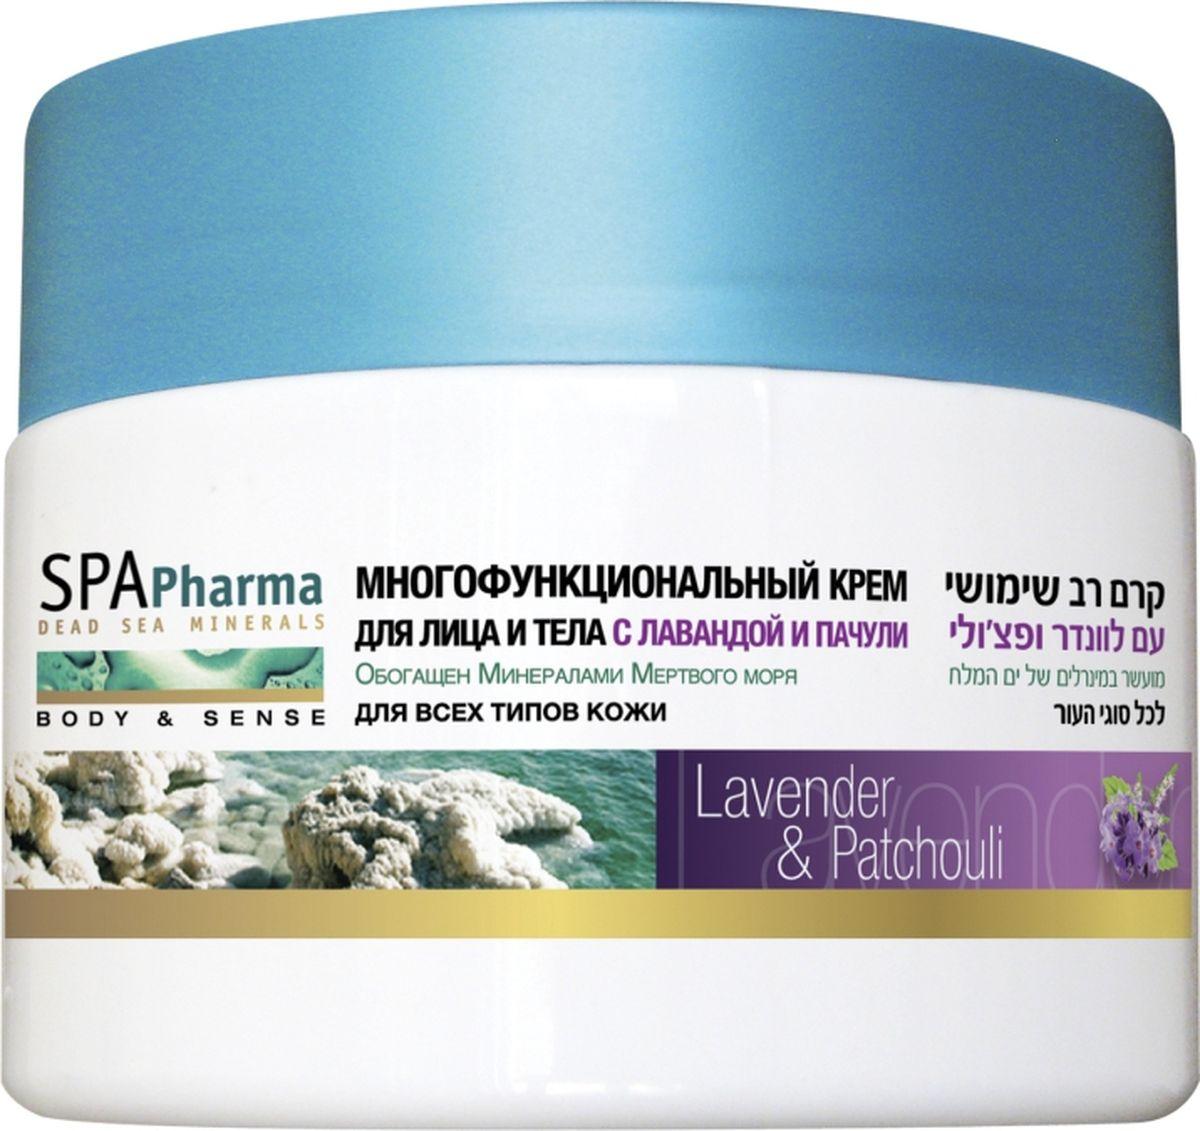 Spa Pharma Многофункциональный крем для лица и тела с лавандой и пачули, Spa Pharma 350 мл ge pharma jetfire в одессе